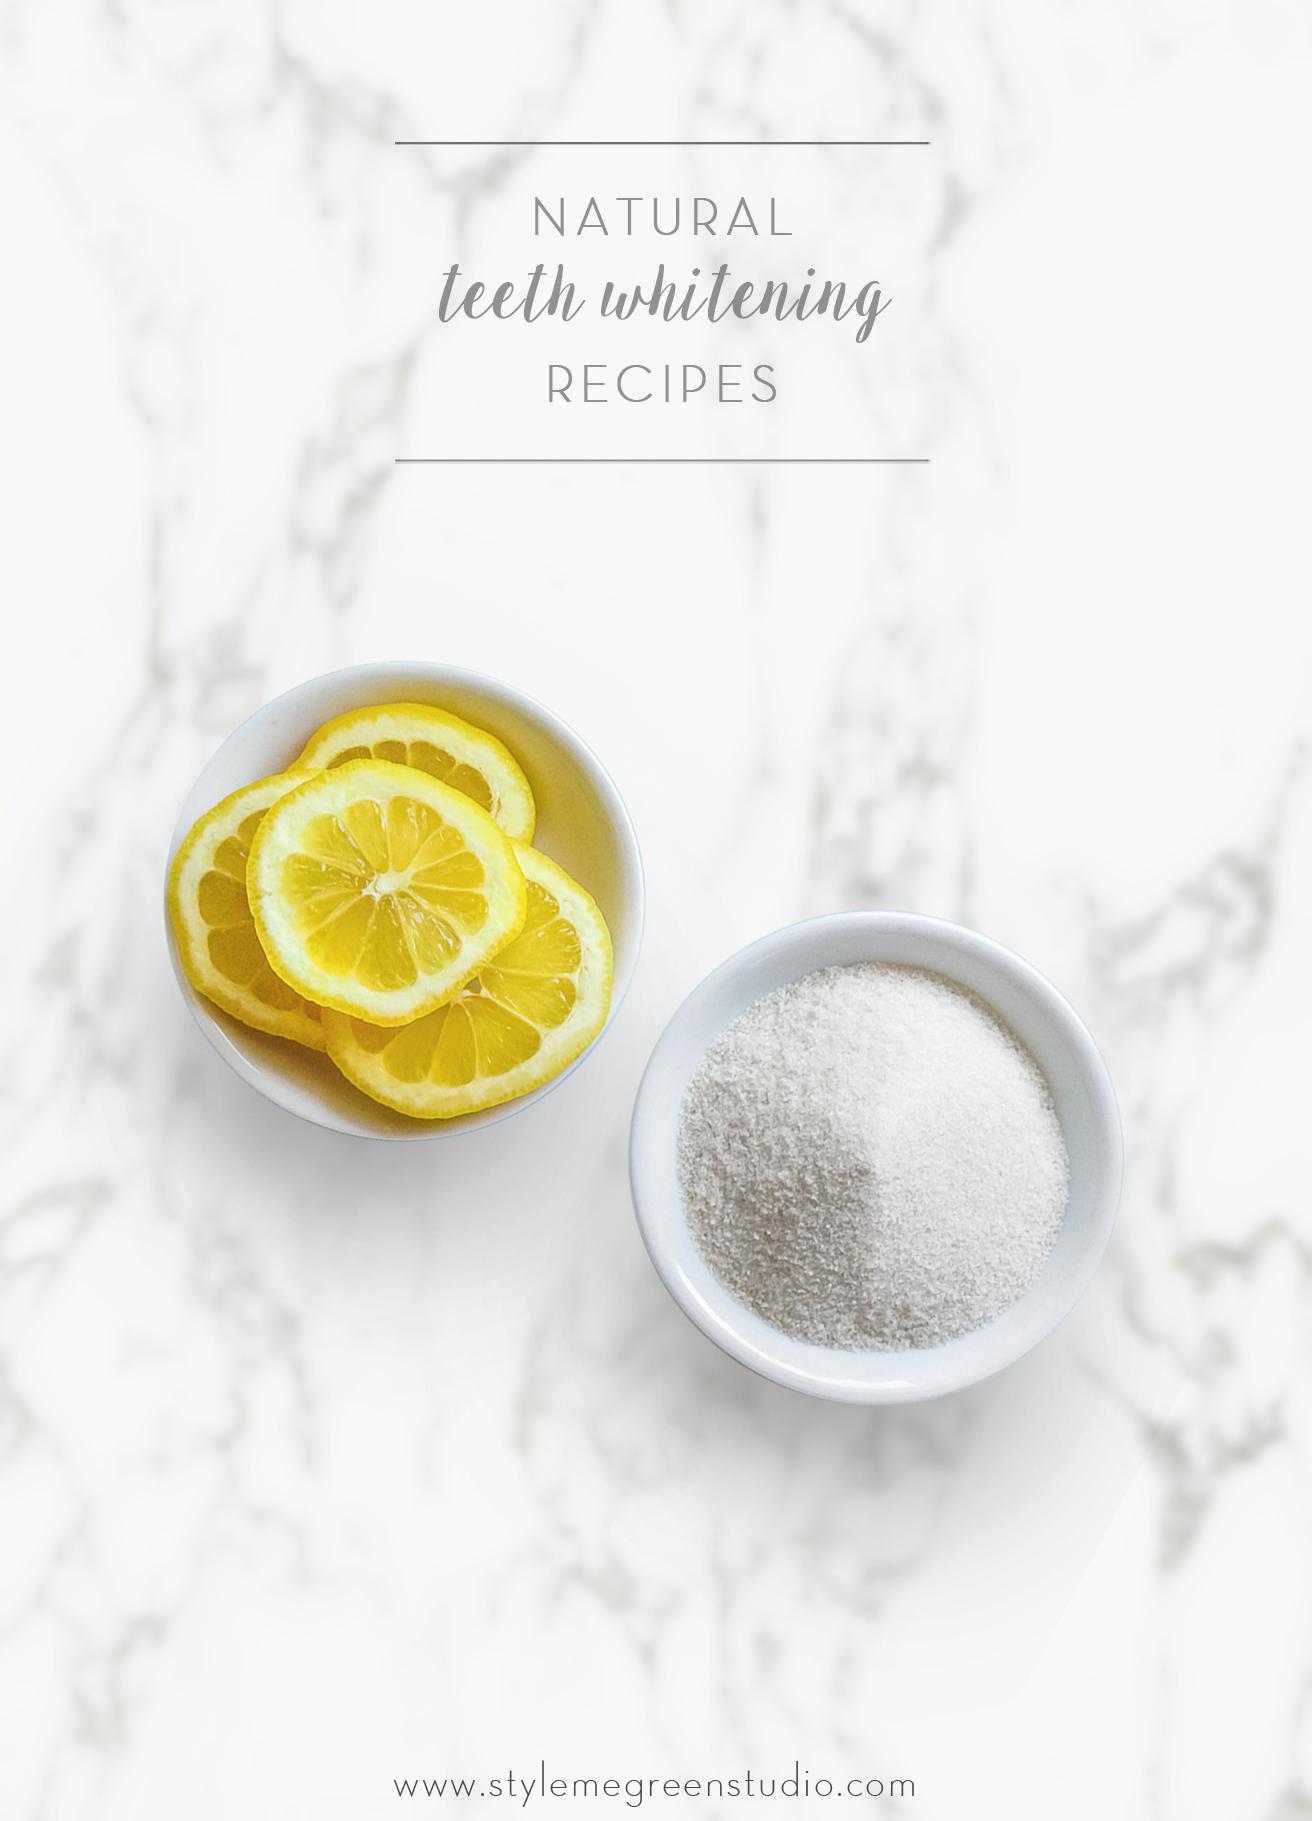 natural teeth whitening recipes